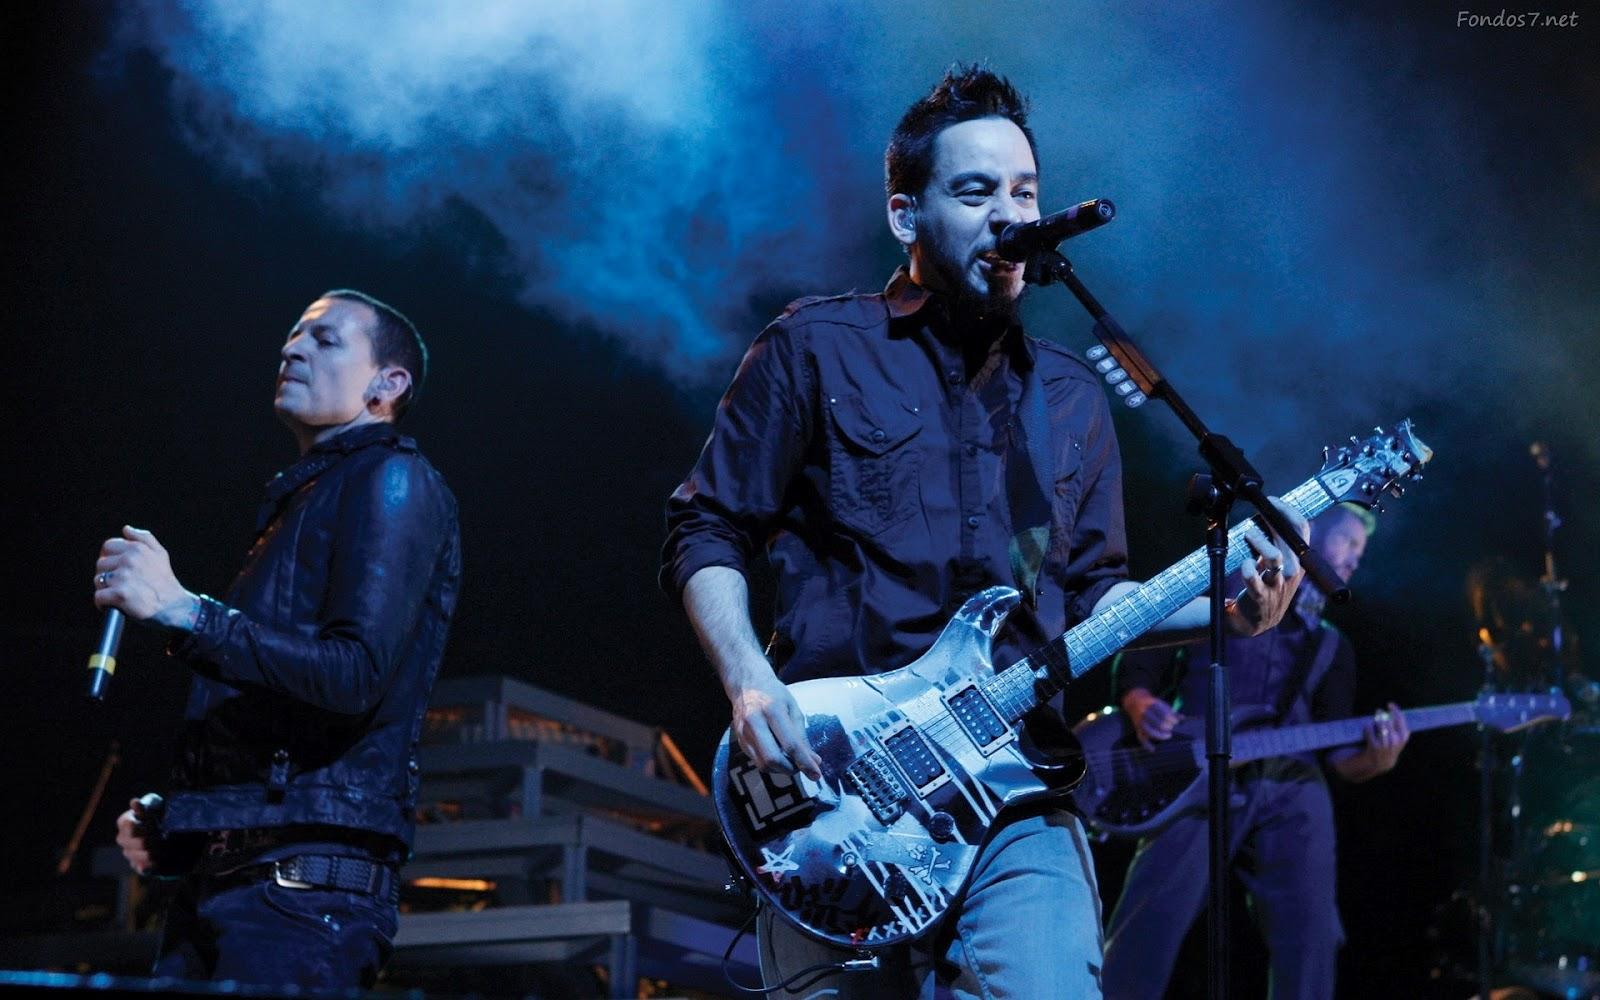 Bleach Wallpaper Hd Iphone 6 Wallpapers Hd Linkin Park Banda De Rock Wallpapers De La